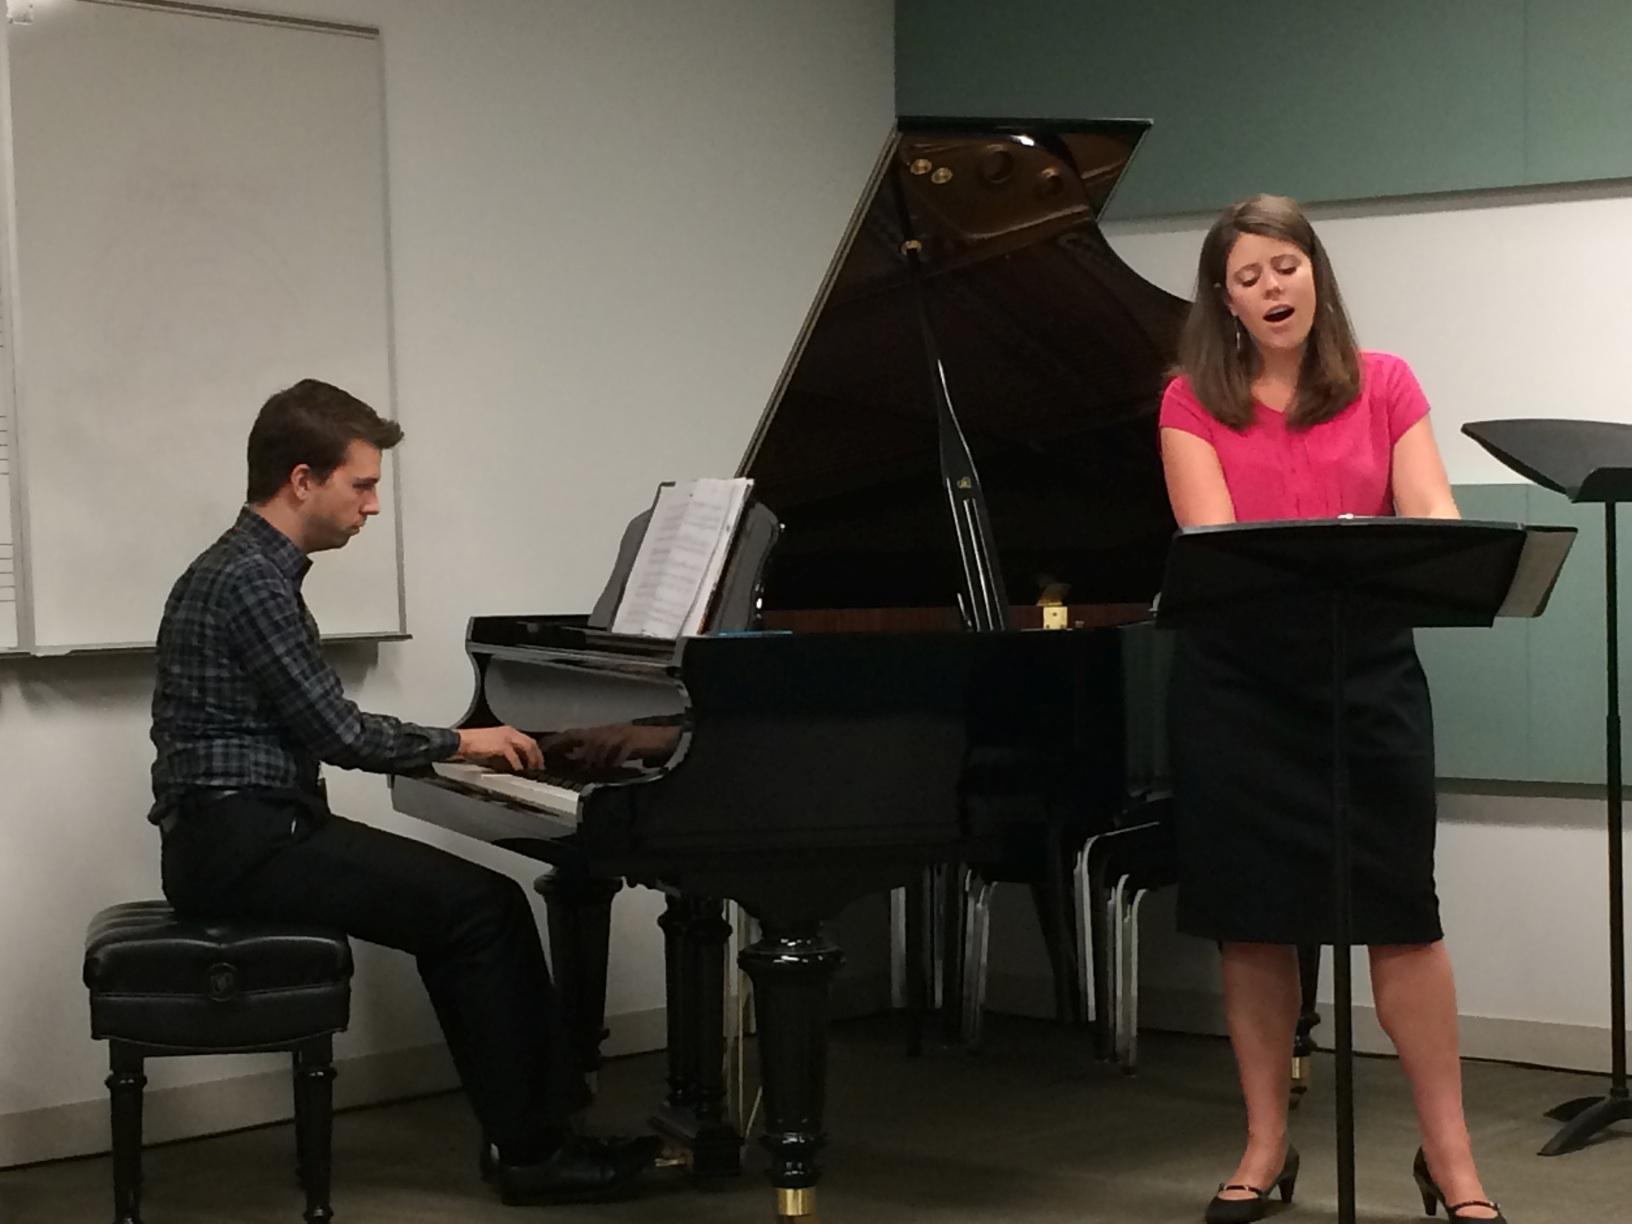 Kristina and Michael rehearsing lullaby thumb.jpg